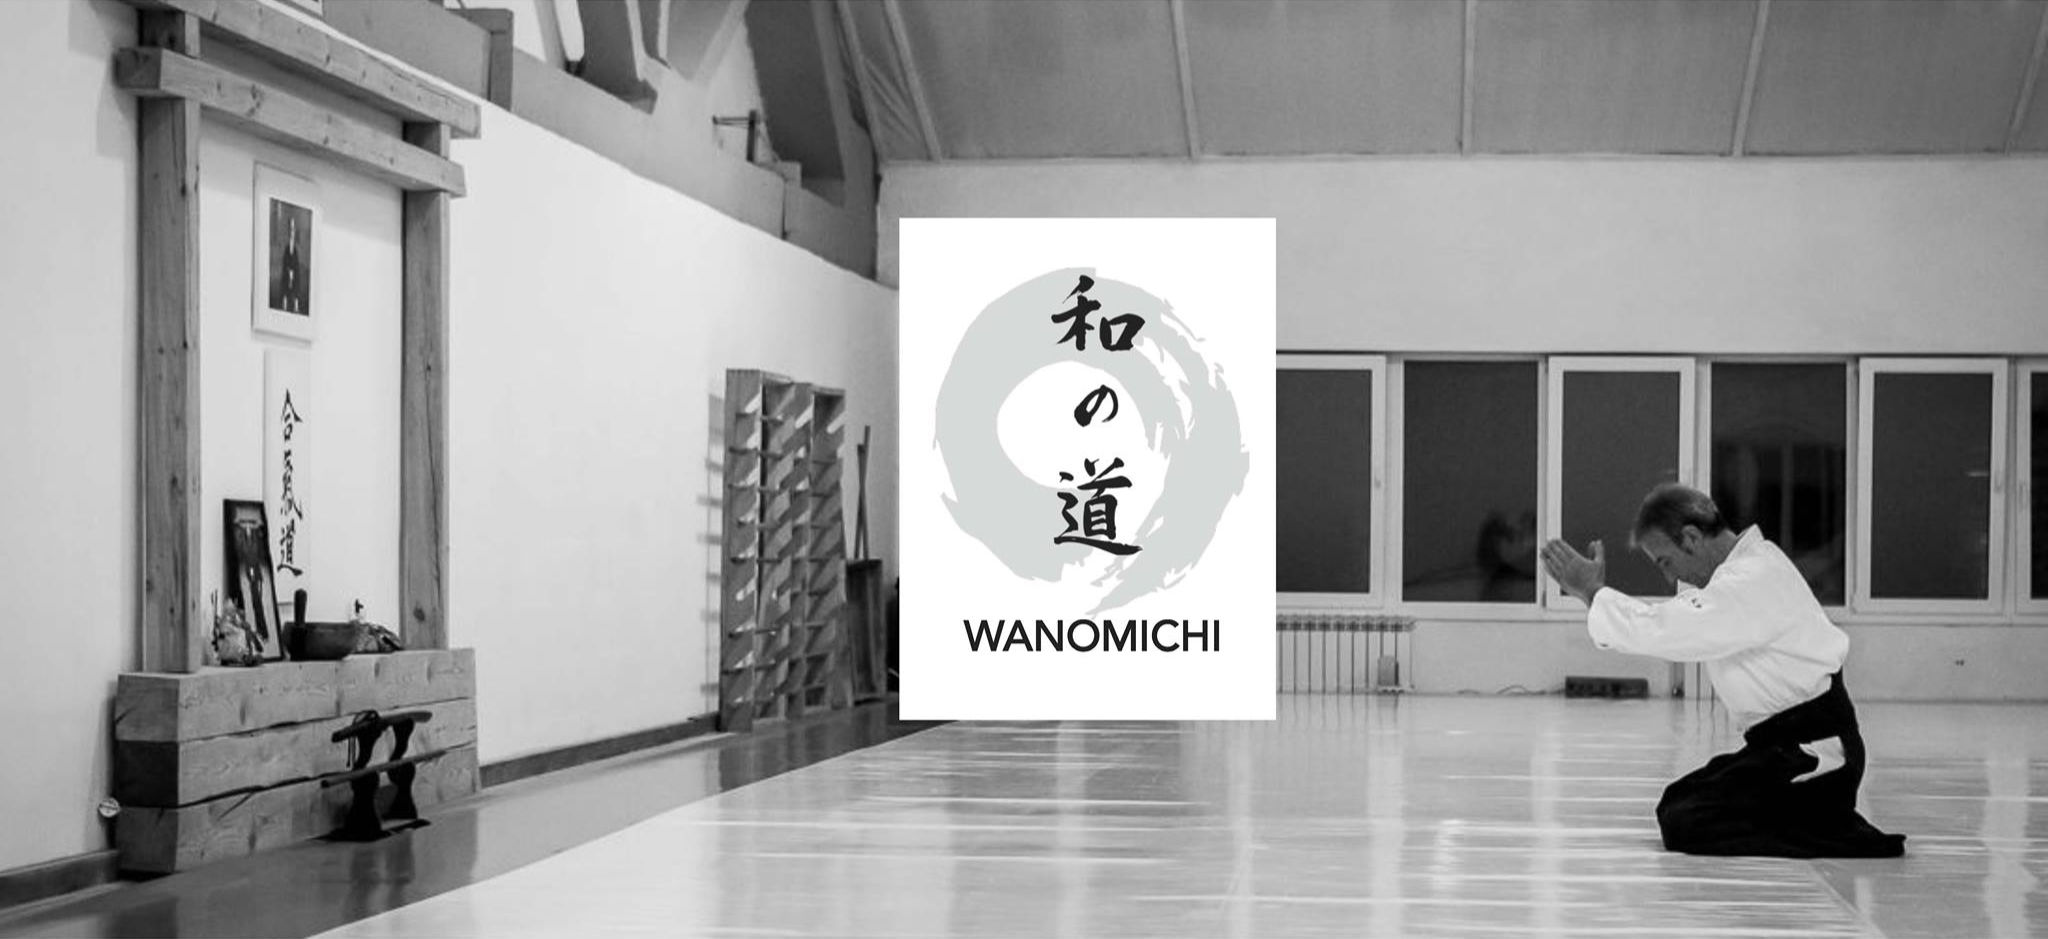 Wanomich, Daniel Toutain